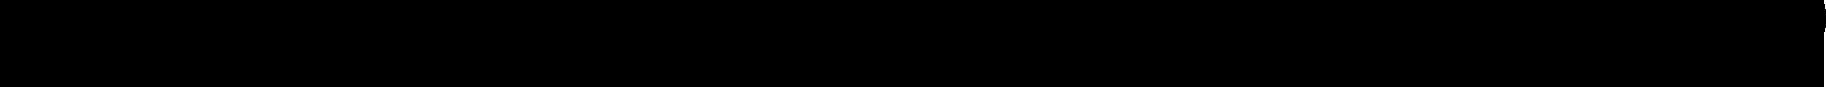 Marriage Script font